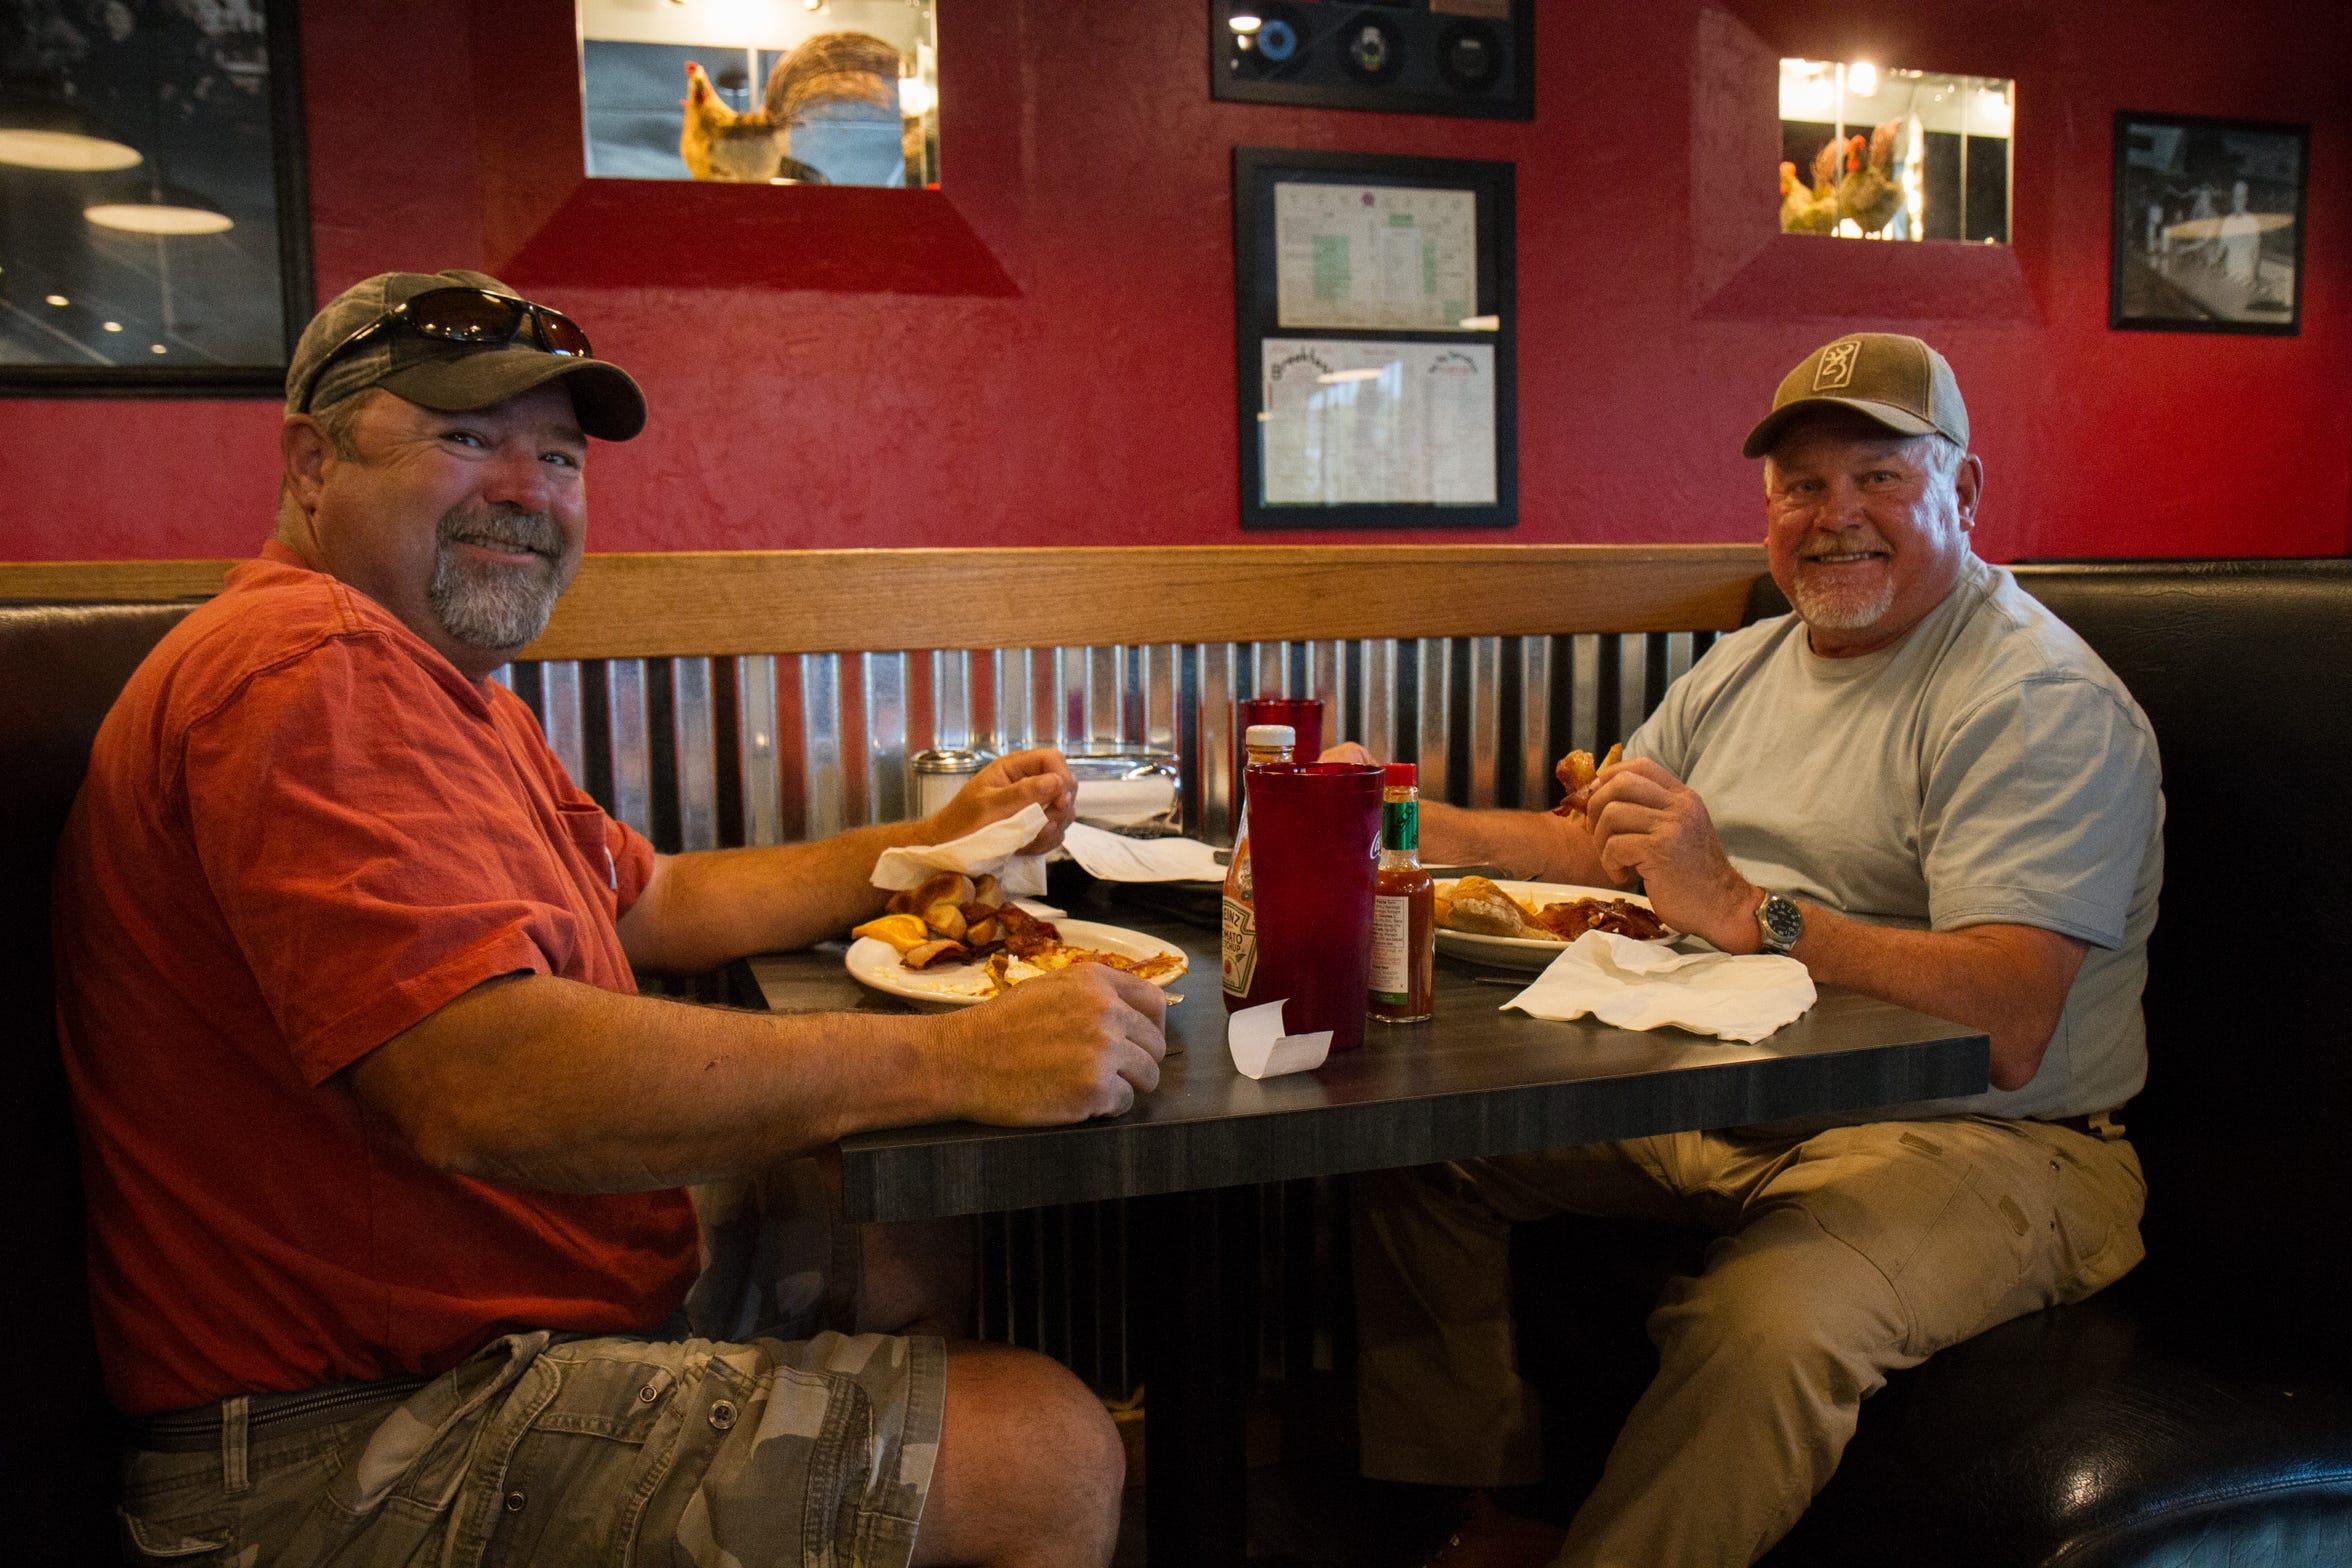 Greg Knorr and Brett Deschenes having breakfast at Tracy's on Thursday morning.